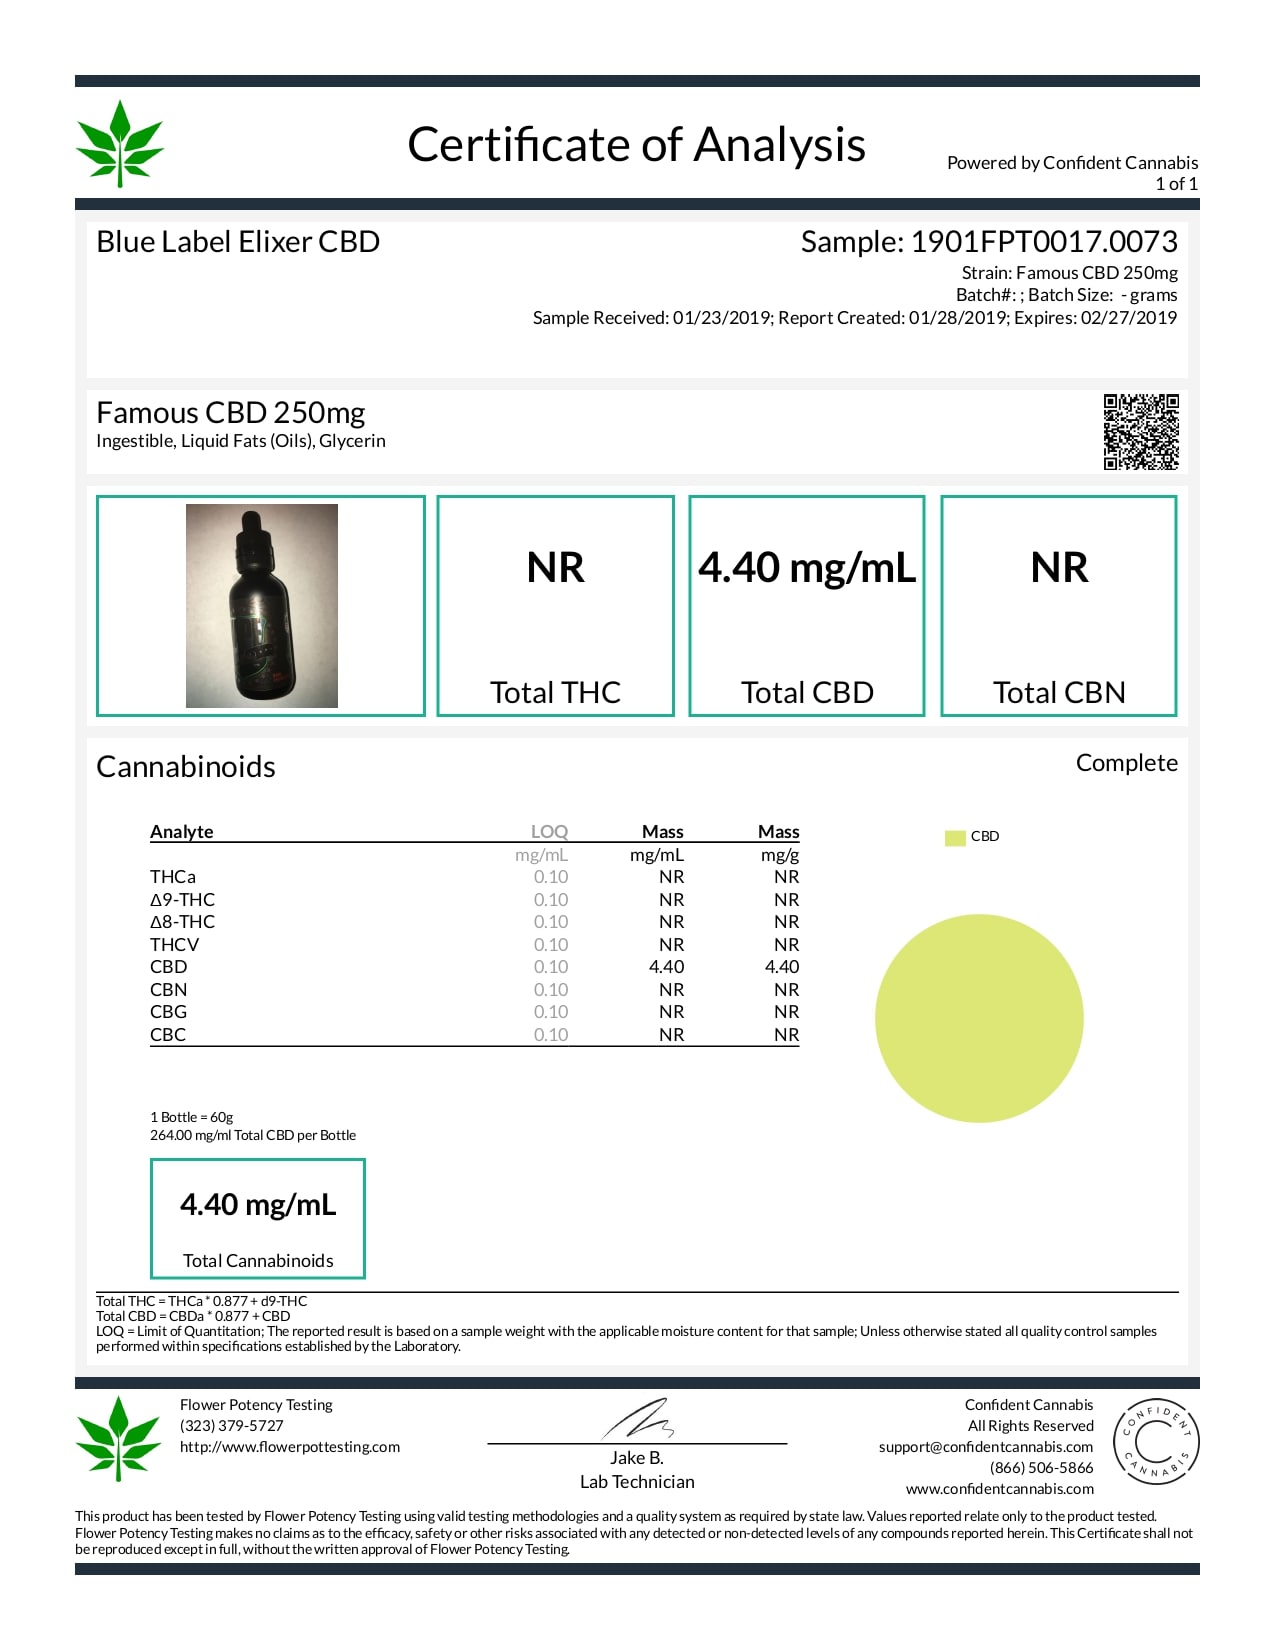 Blue Label CBD Vape Juice Famous! 250mg Lab Report